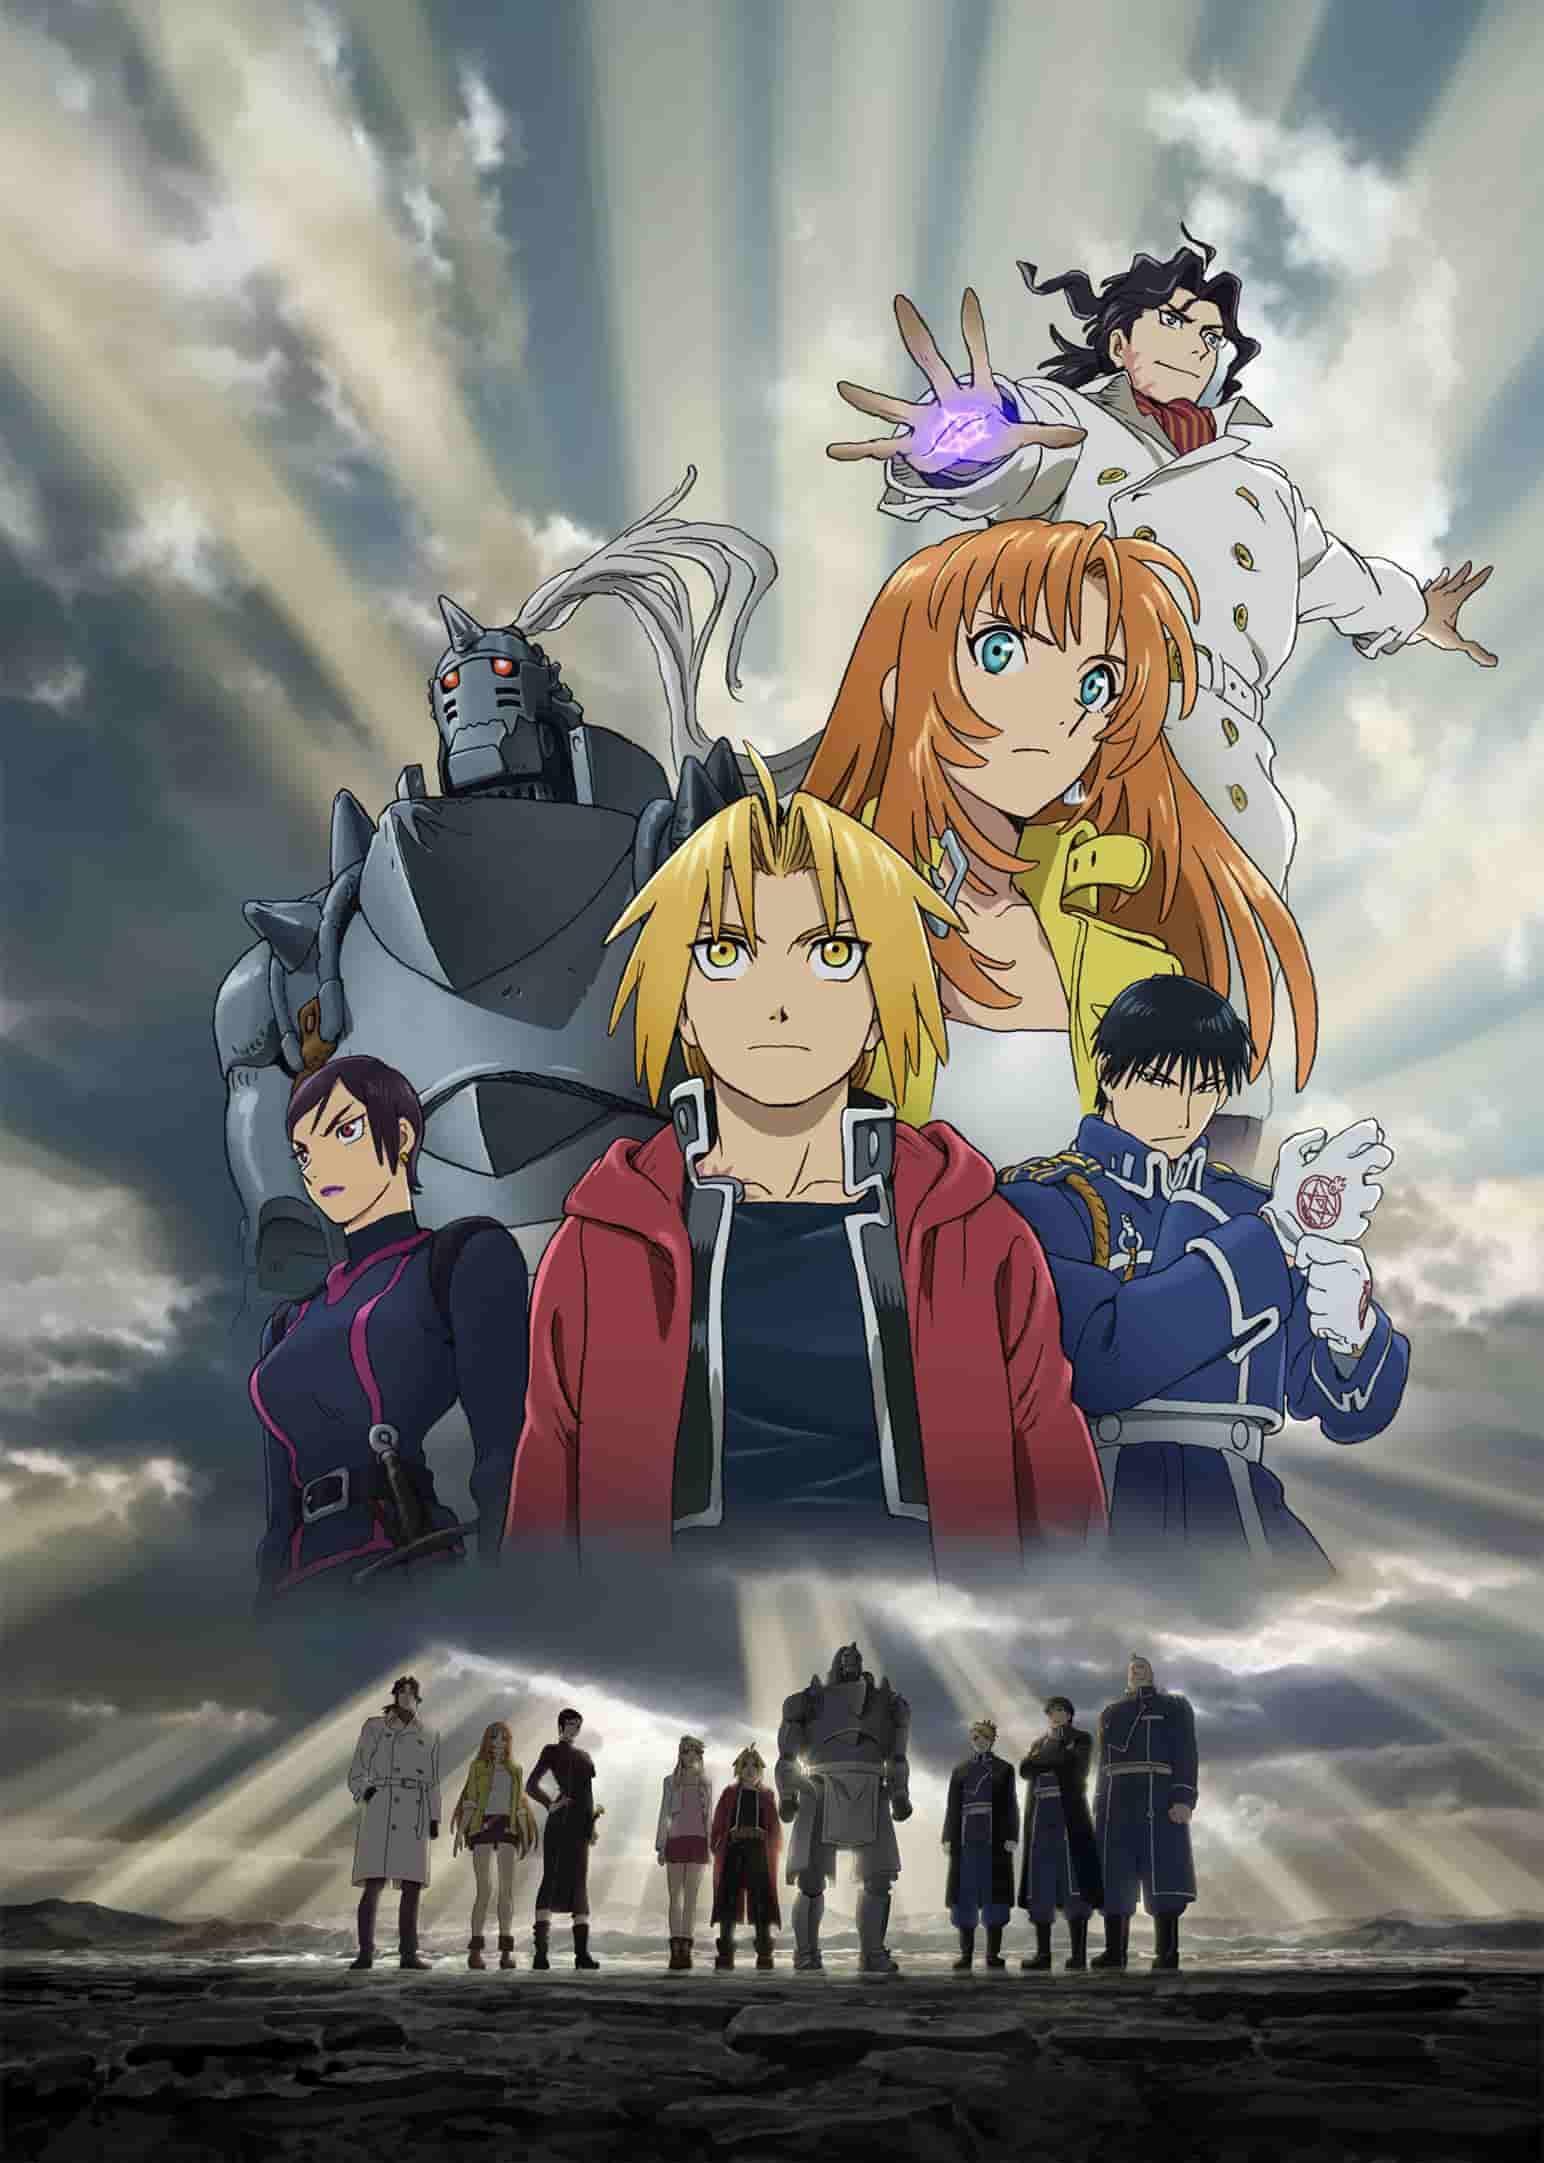 >Fullmetal Alchemist The Movie แขนกลคนแปรธาตุ เดอะมูฟวี่ ทุกภาค